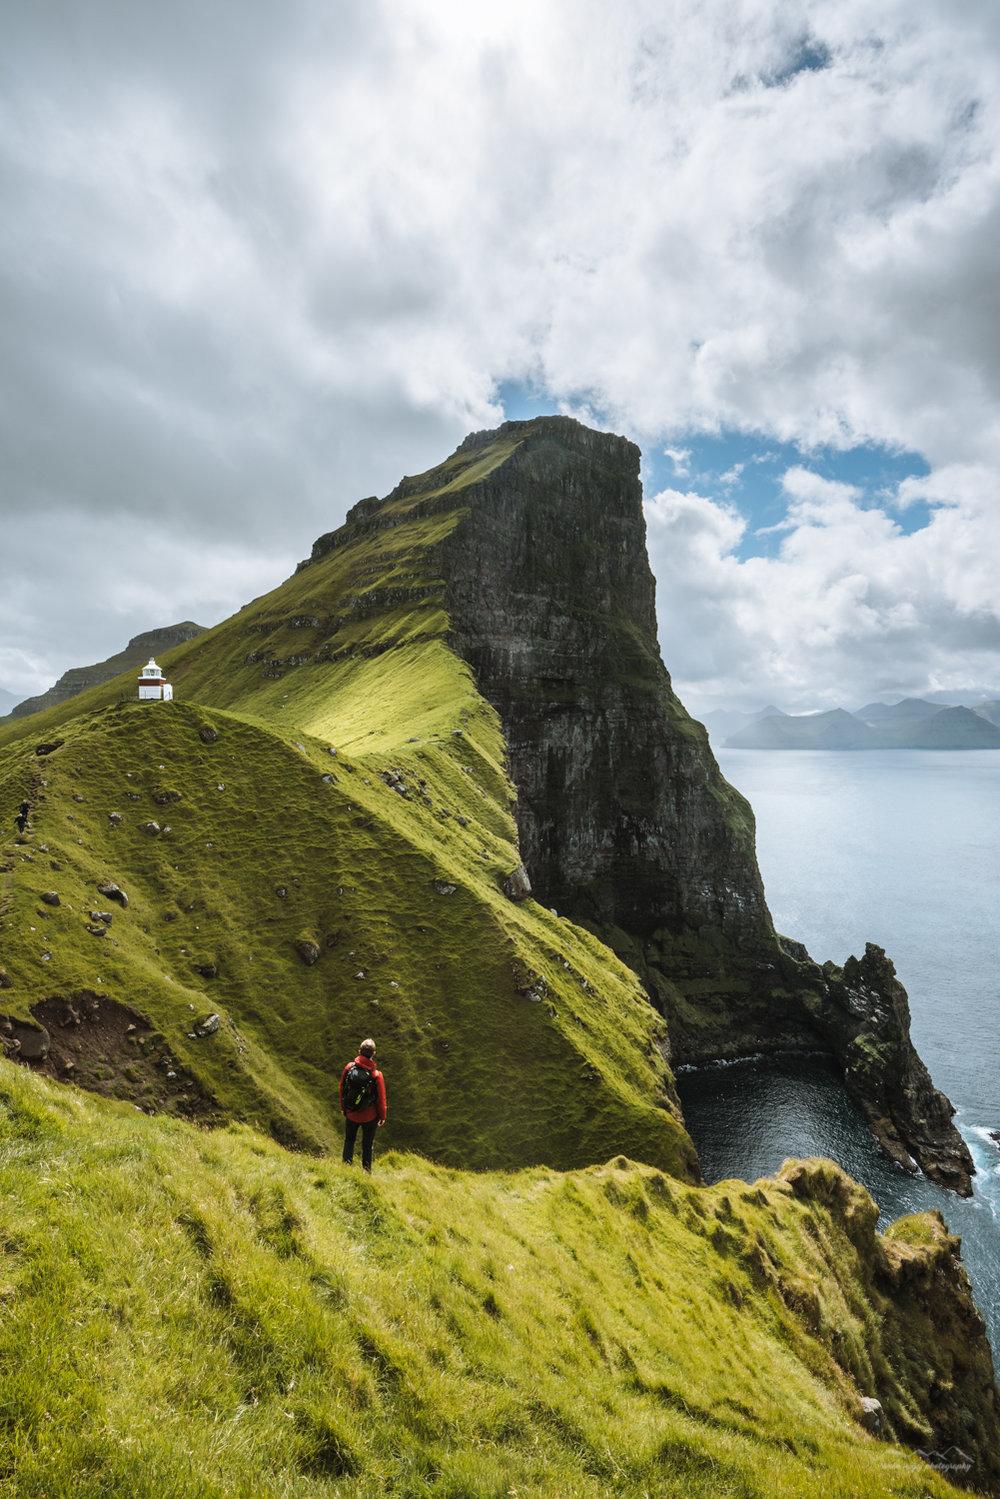 Admiring the Kallur Lighthouse. Kalsoy, Faroe Islands